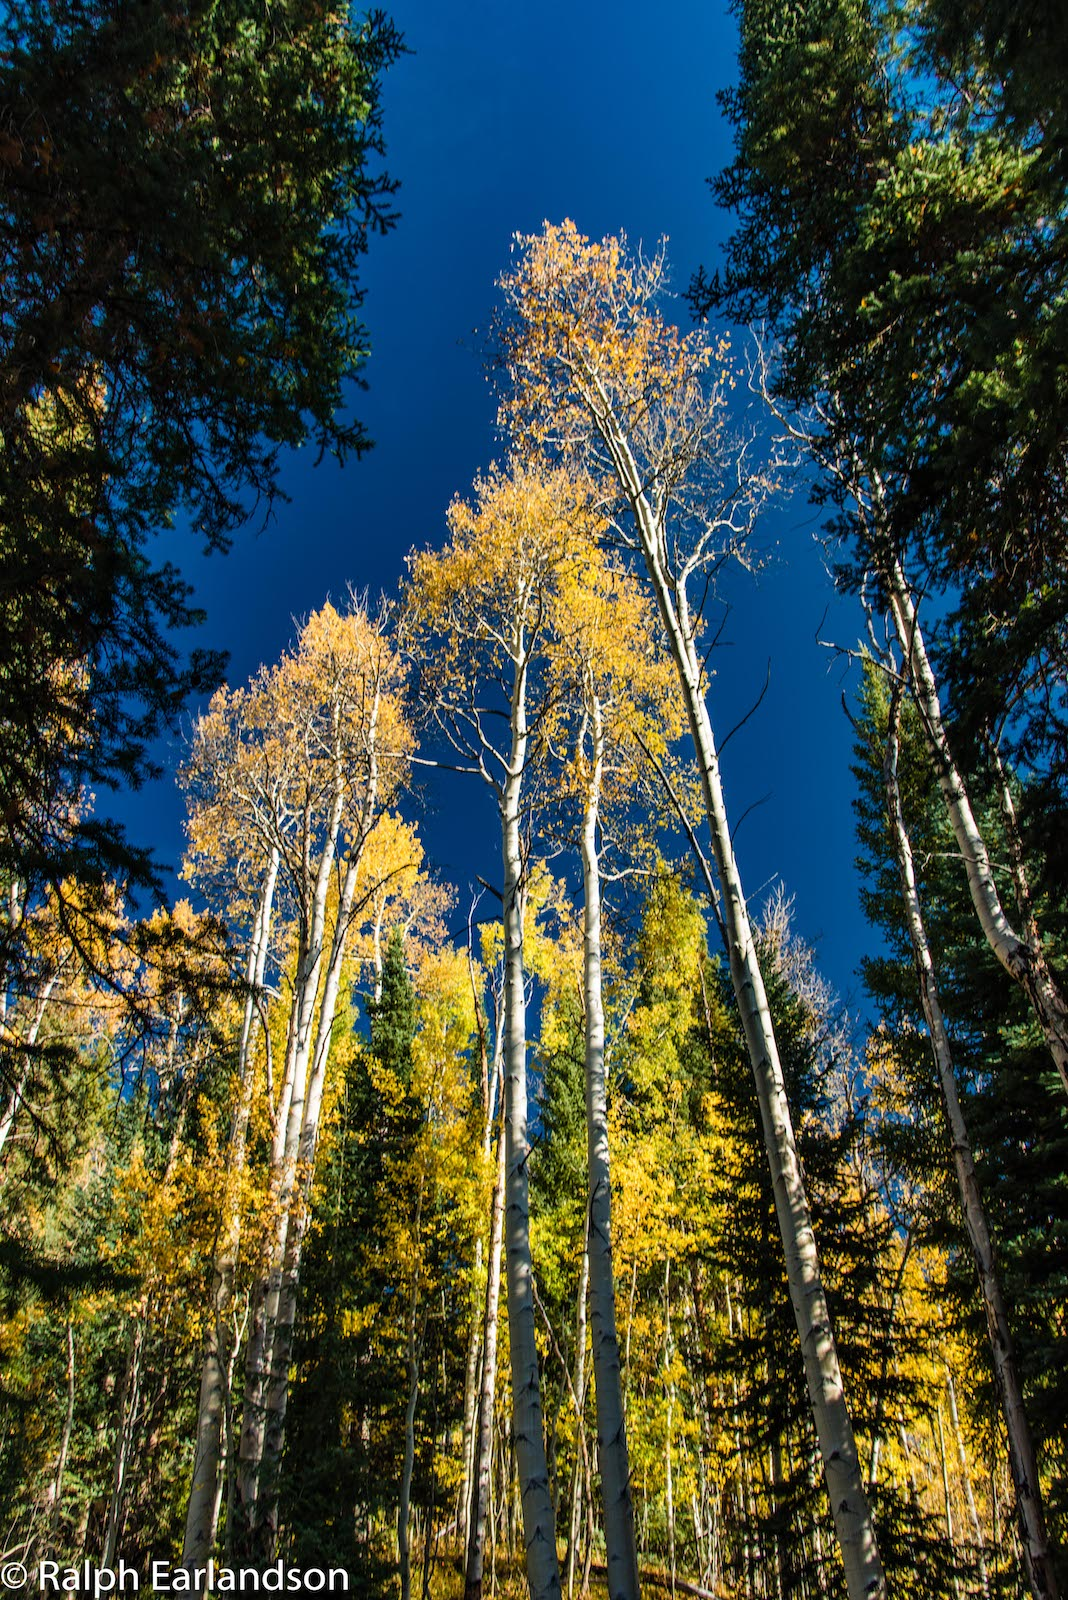 Aspen Hutan Nasional Sungai Putih Warna Jatuh Frisco CO